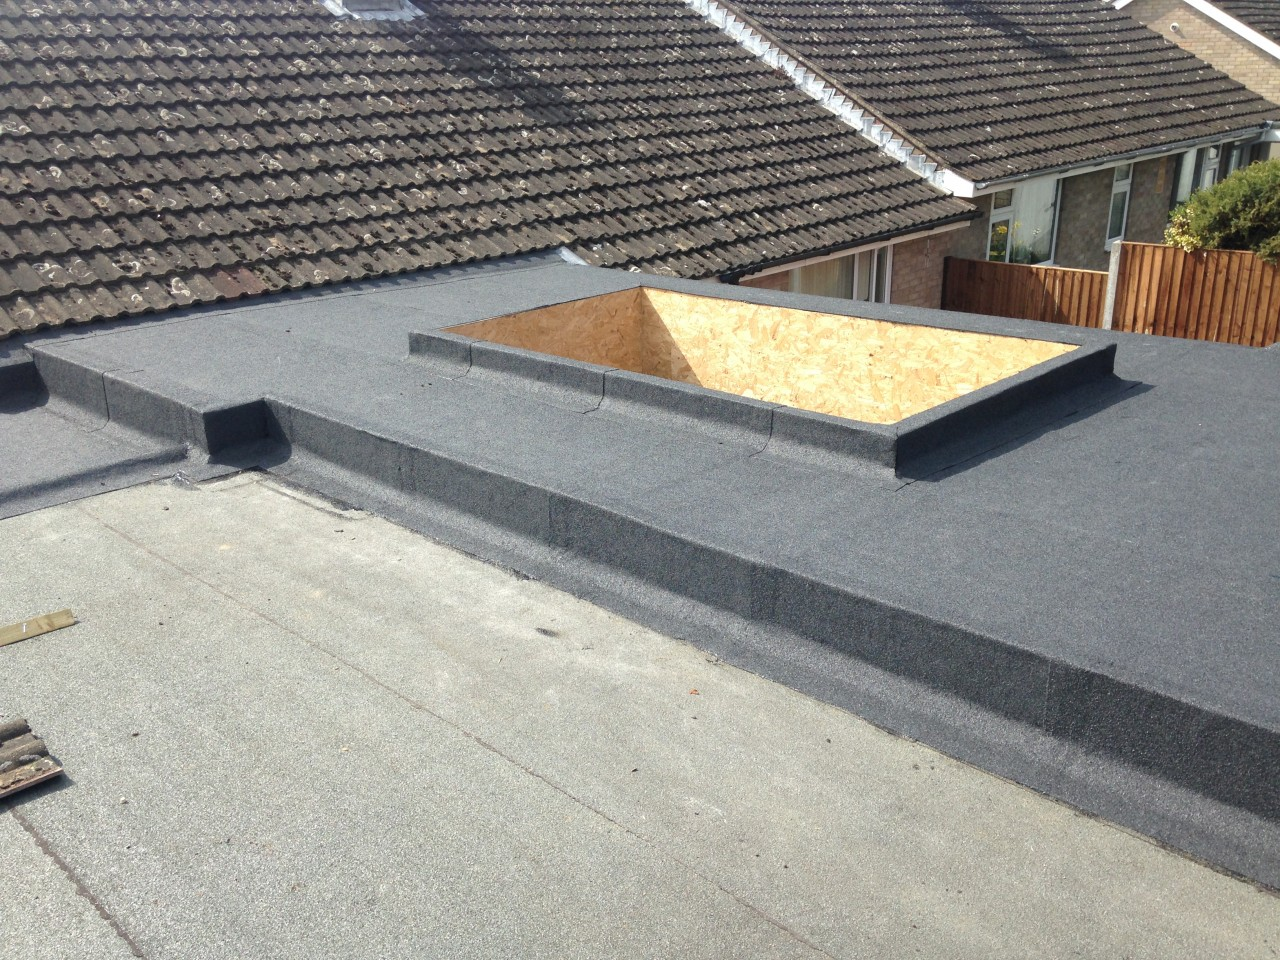 Nvq Level 2 Built Up Bituminous Roofing Eastern Region